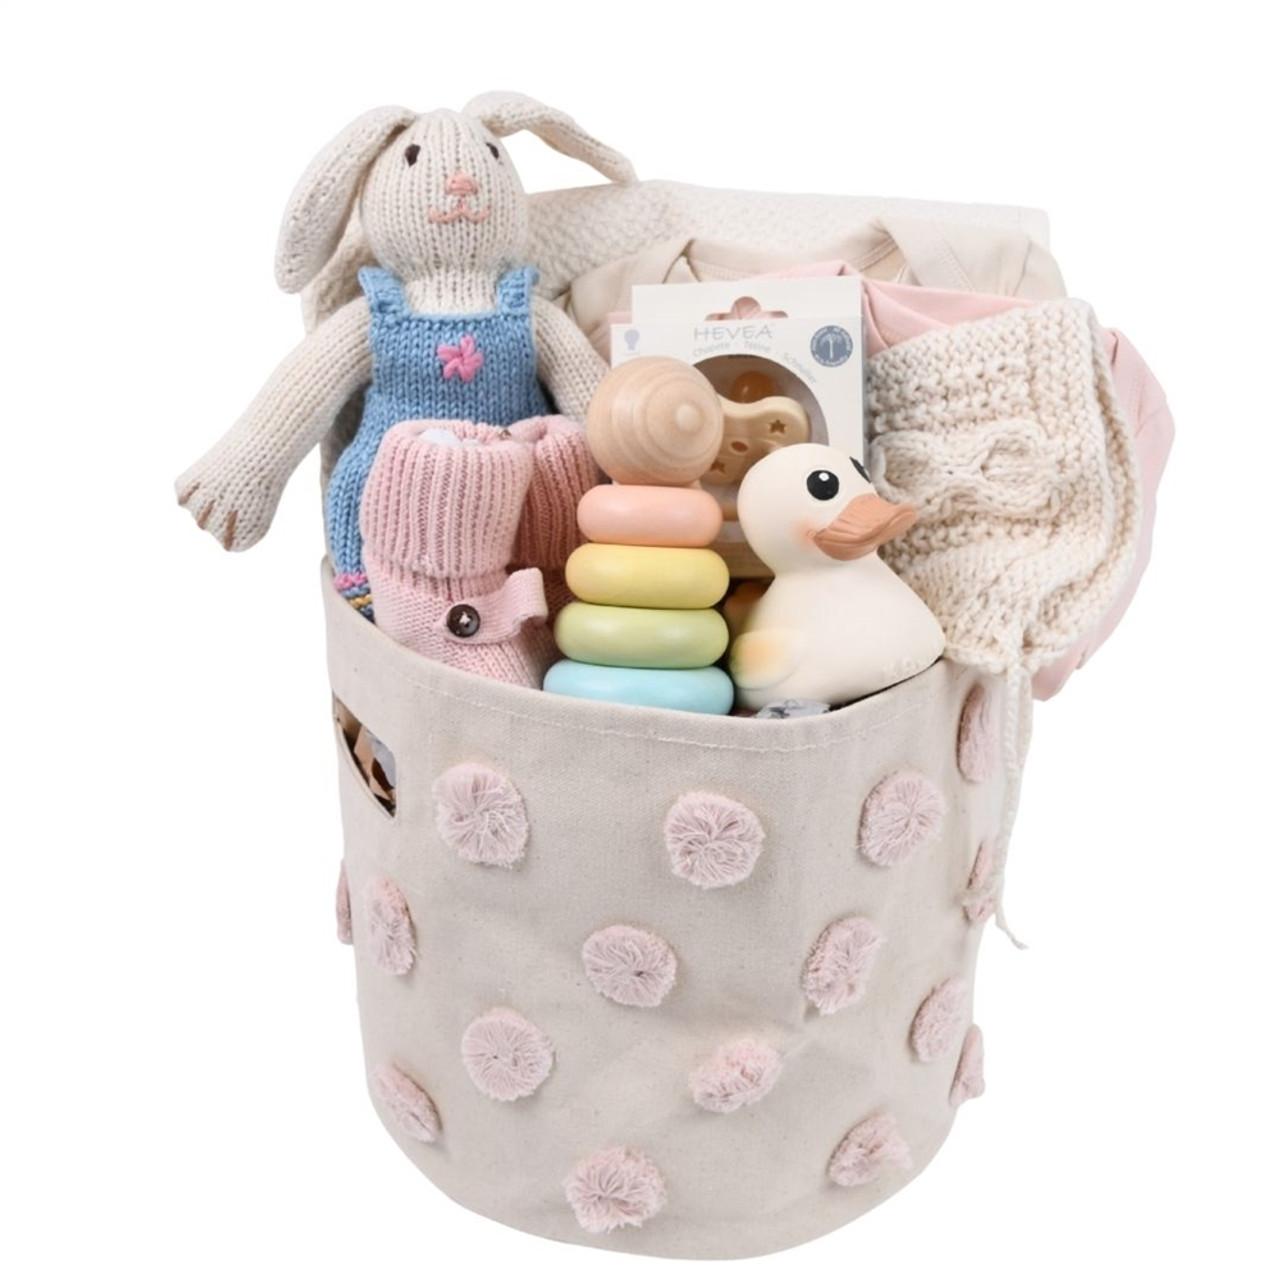 Baby Gift Basket - Playful Pastels